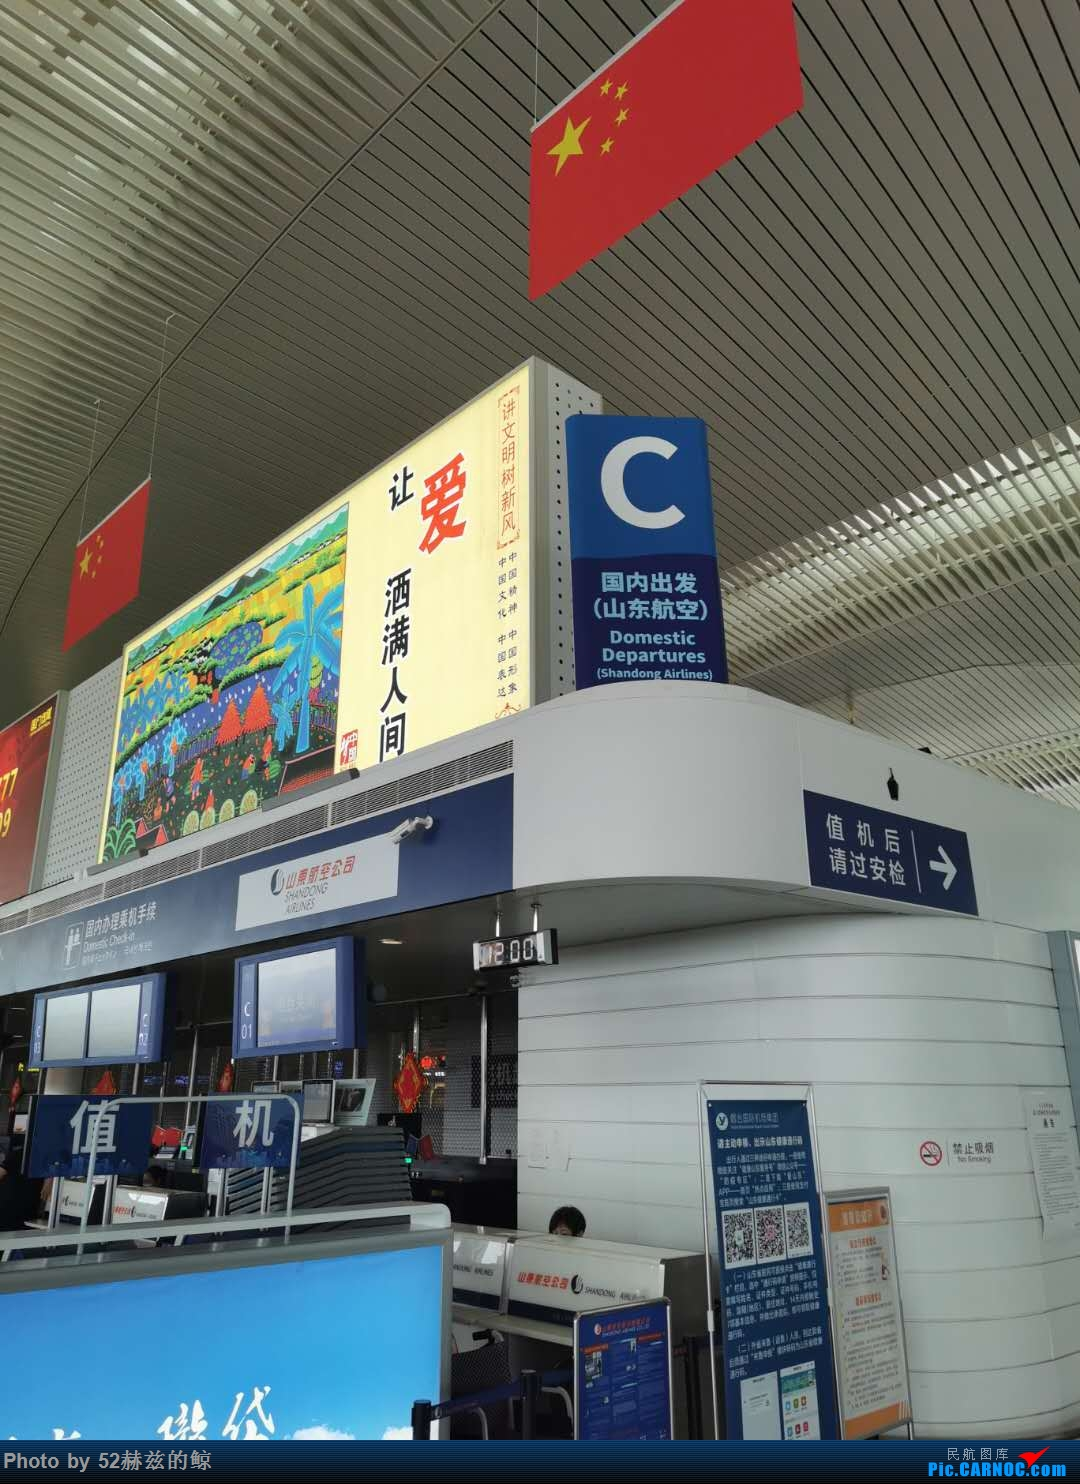 Re:[原创]2020.7&2020.8北京-广州-烟台-北京    中国烟台蓬莱国际机场